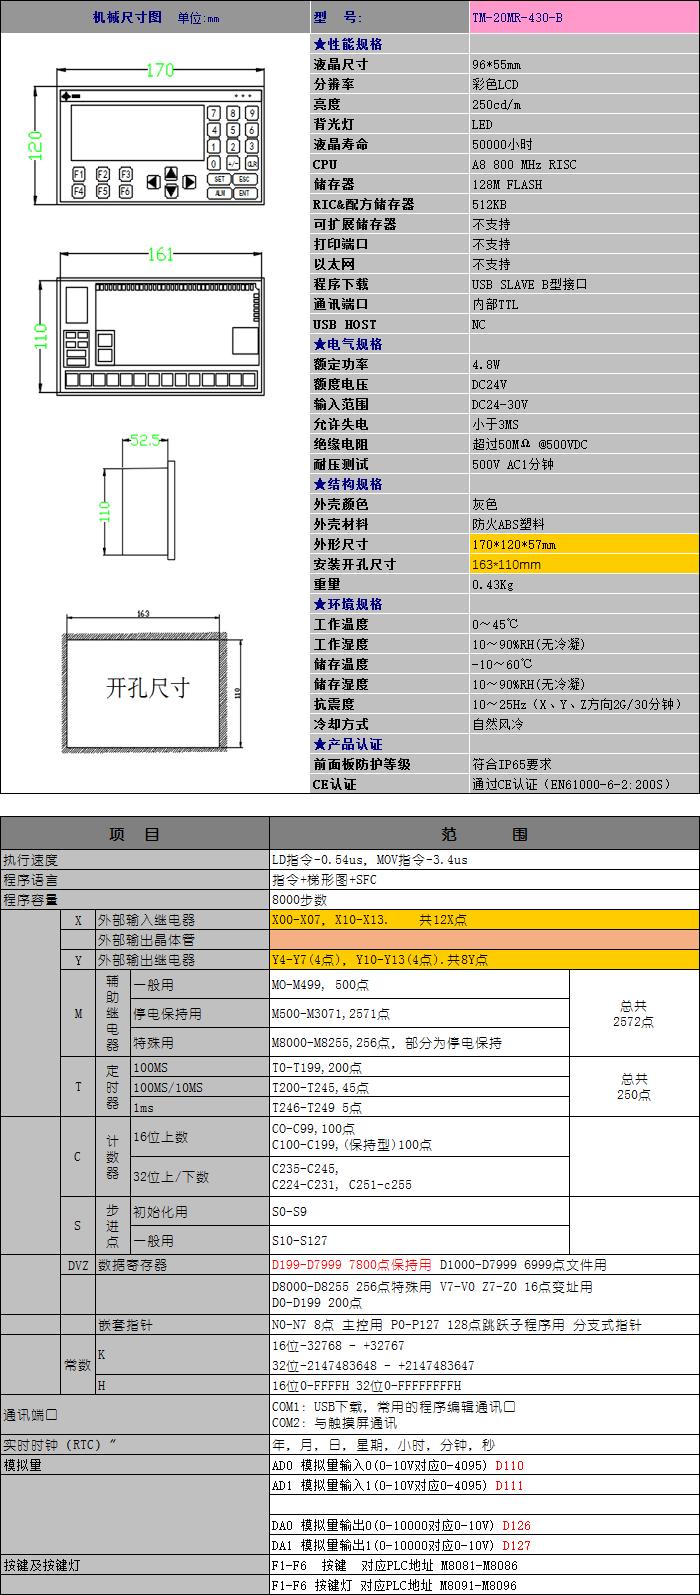 TM-20MR-430-B屏PLC介绍.png